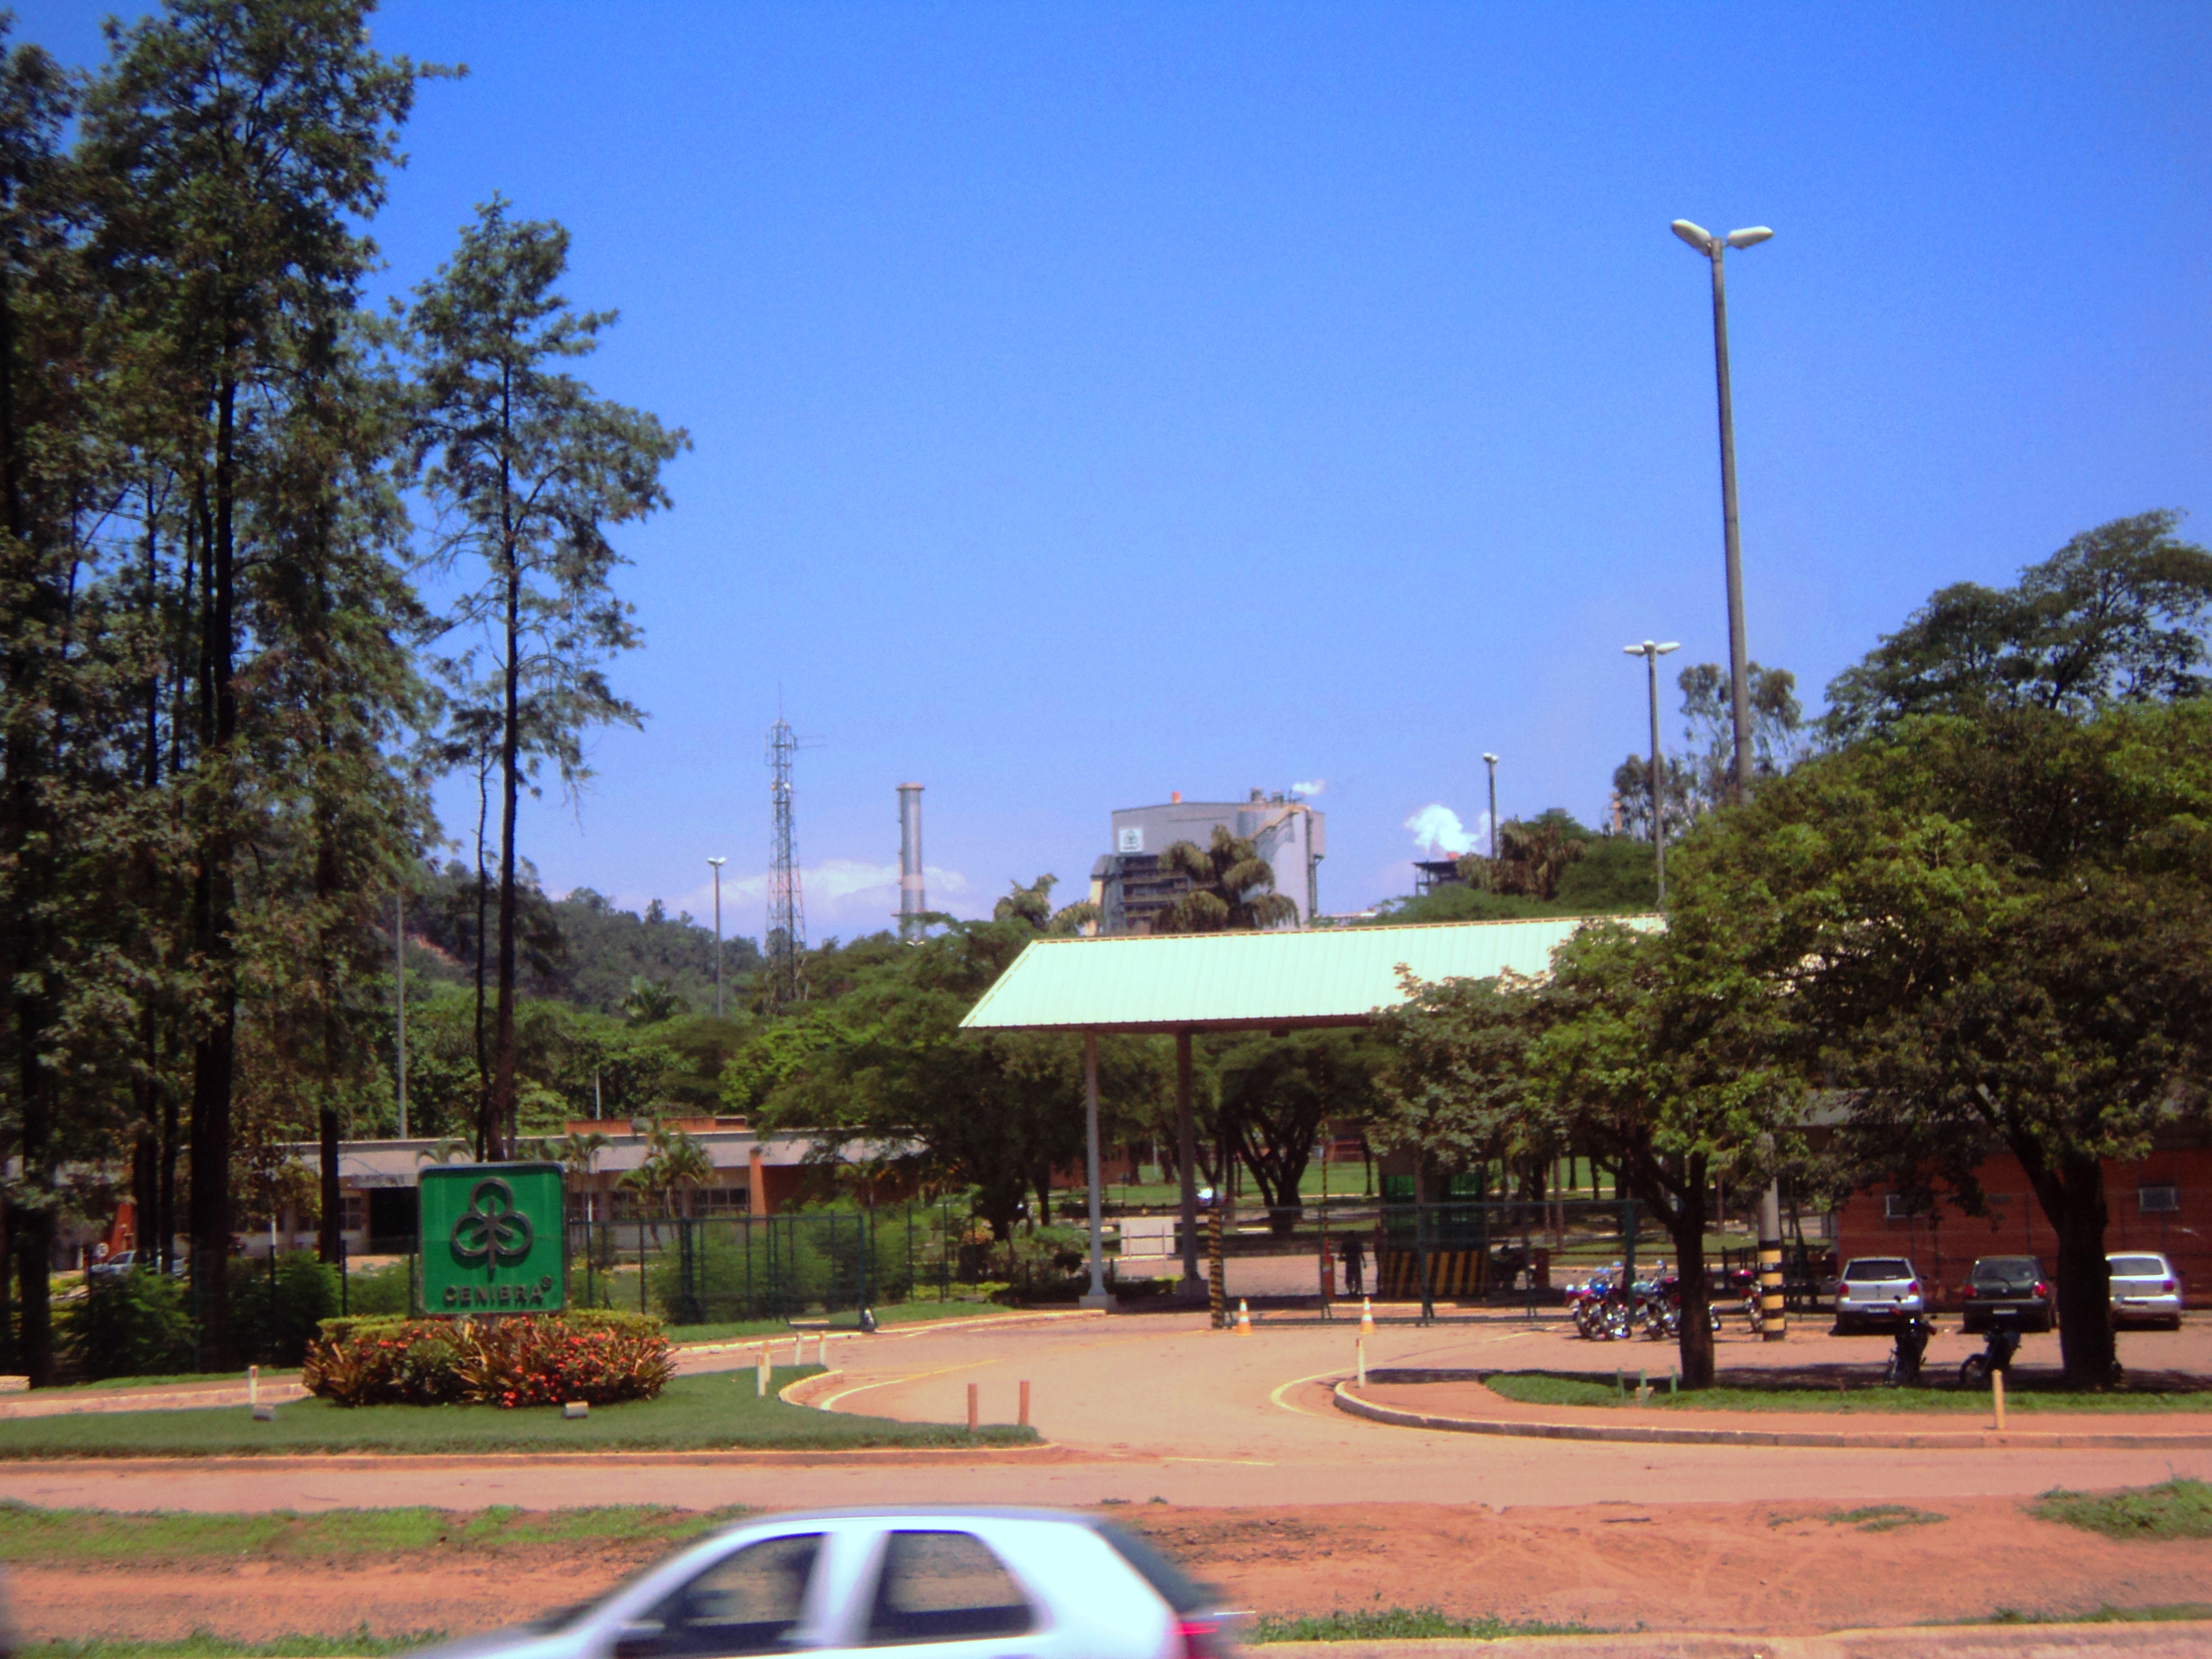 Belo Oriente Minas Gerais fonte: upload.wikimedia.org